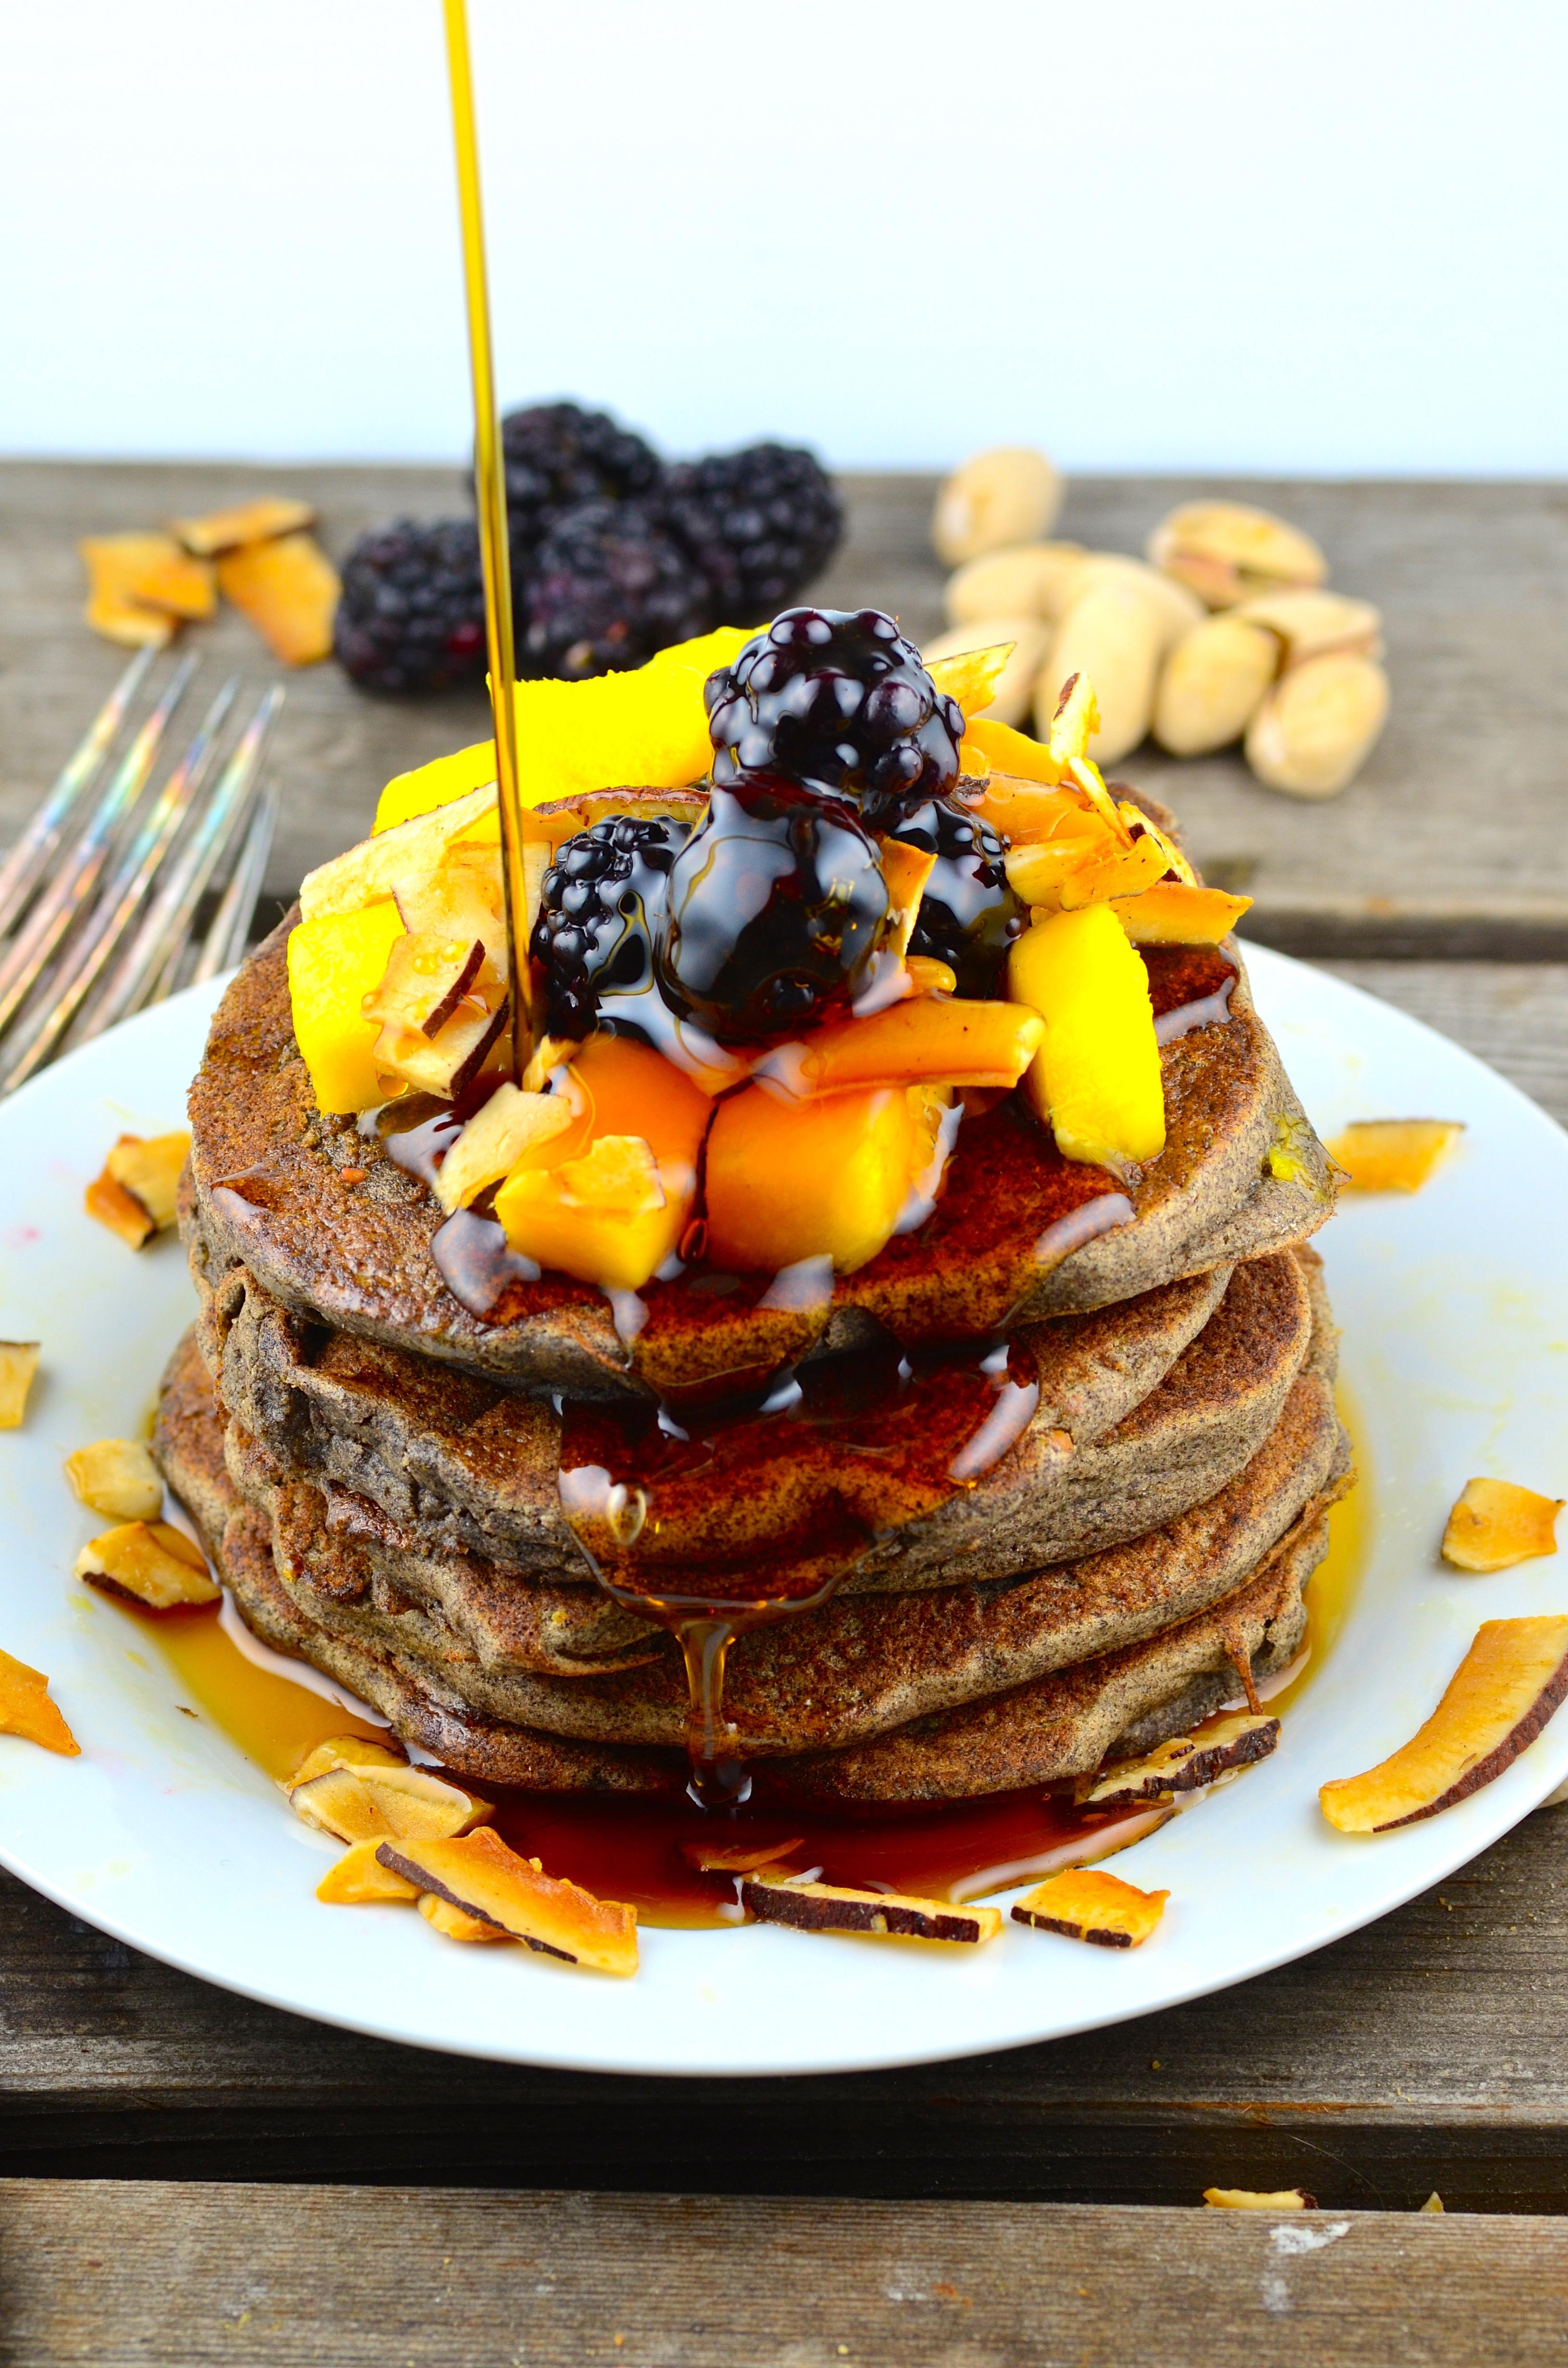 Buckwheat & Pistachio Pancakes (Vegan & Gluten Free)